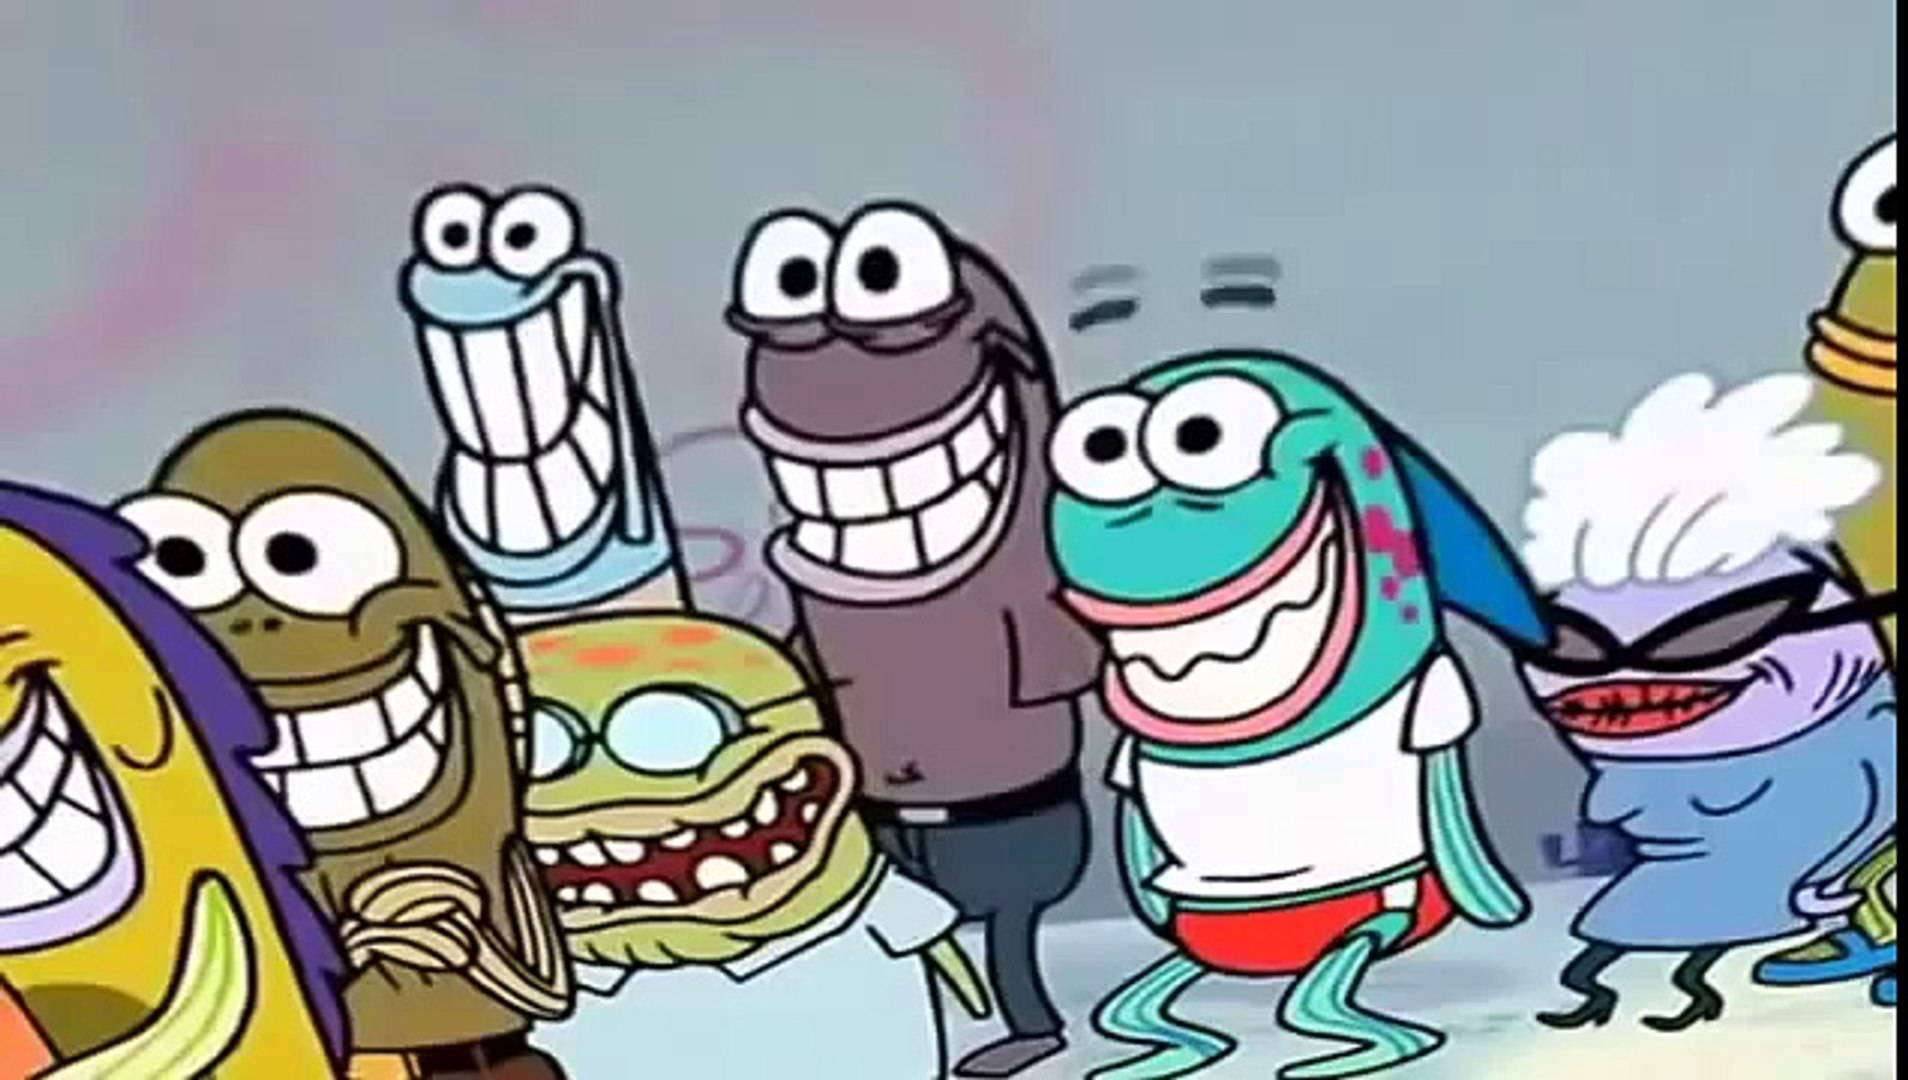 Spongebob Christmas Special.Spongebob Squarepants New Year Christmas Full Episodes Spongebob Cartoon